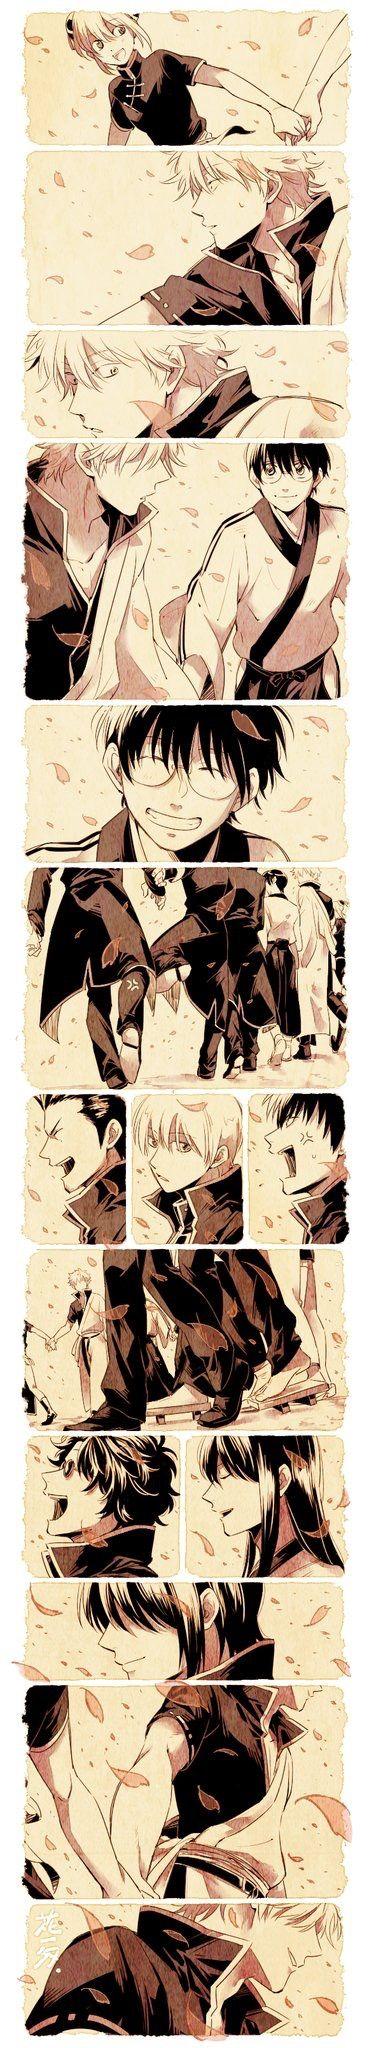 Love this anime